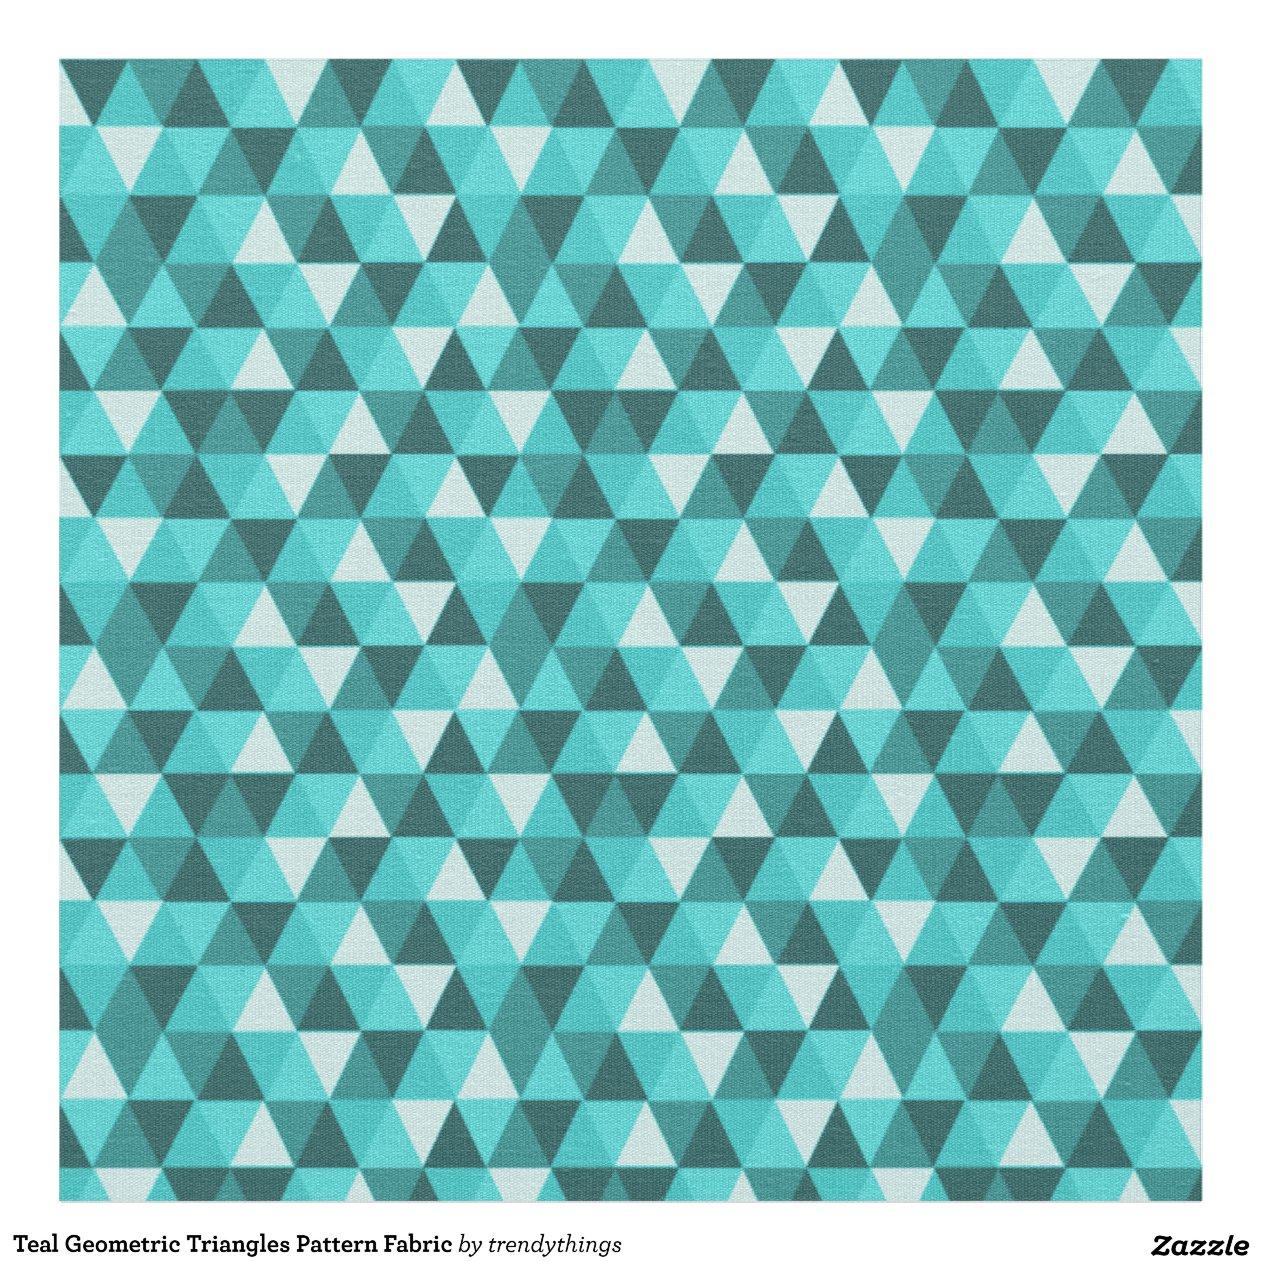 tissu g om trique turquoise de motif de triangles zazzle. Black Bedroom Furniture Sets. Home Design Ideas